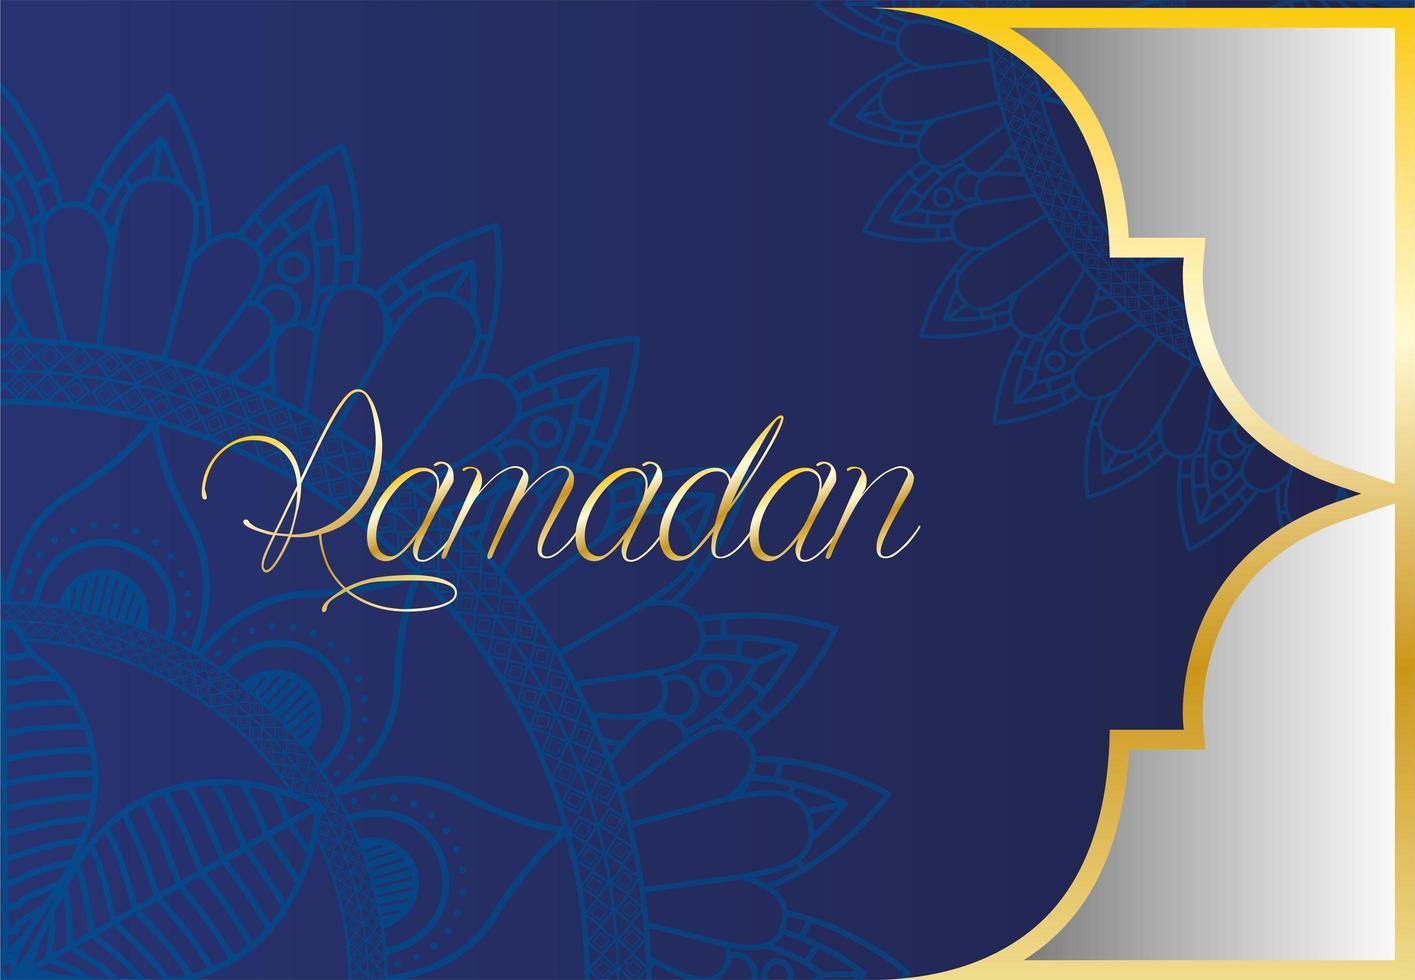 mandala ramadan kareem patroon met gouden frame vector